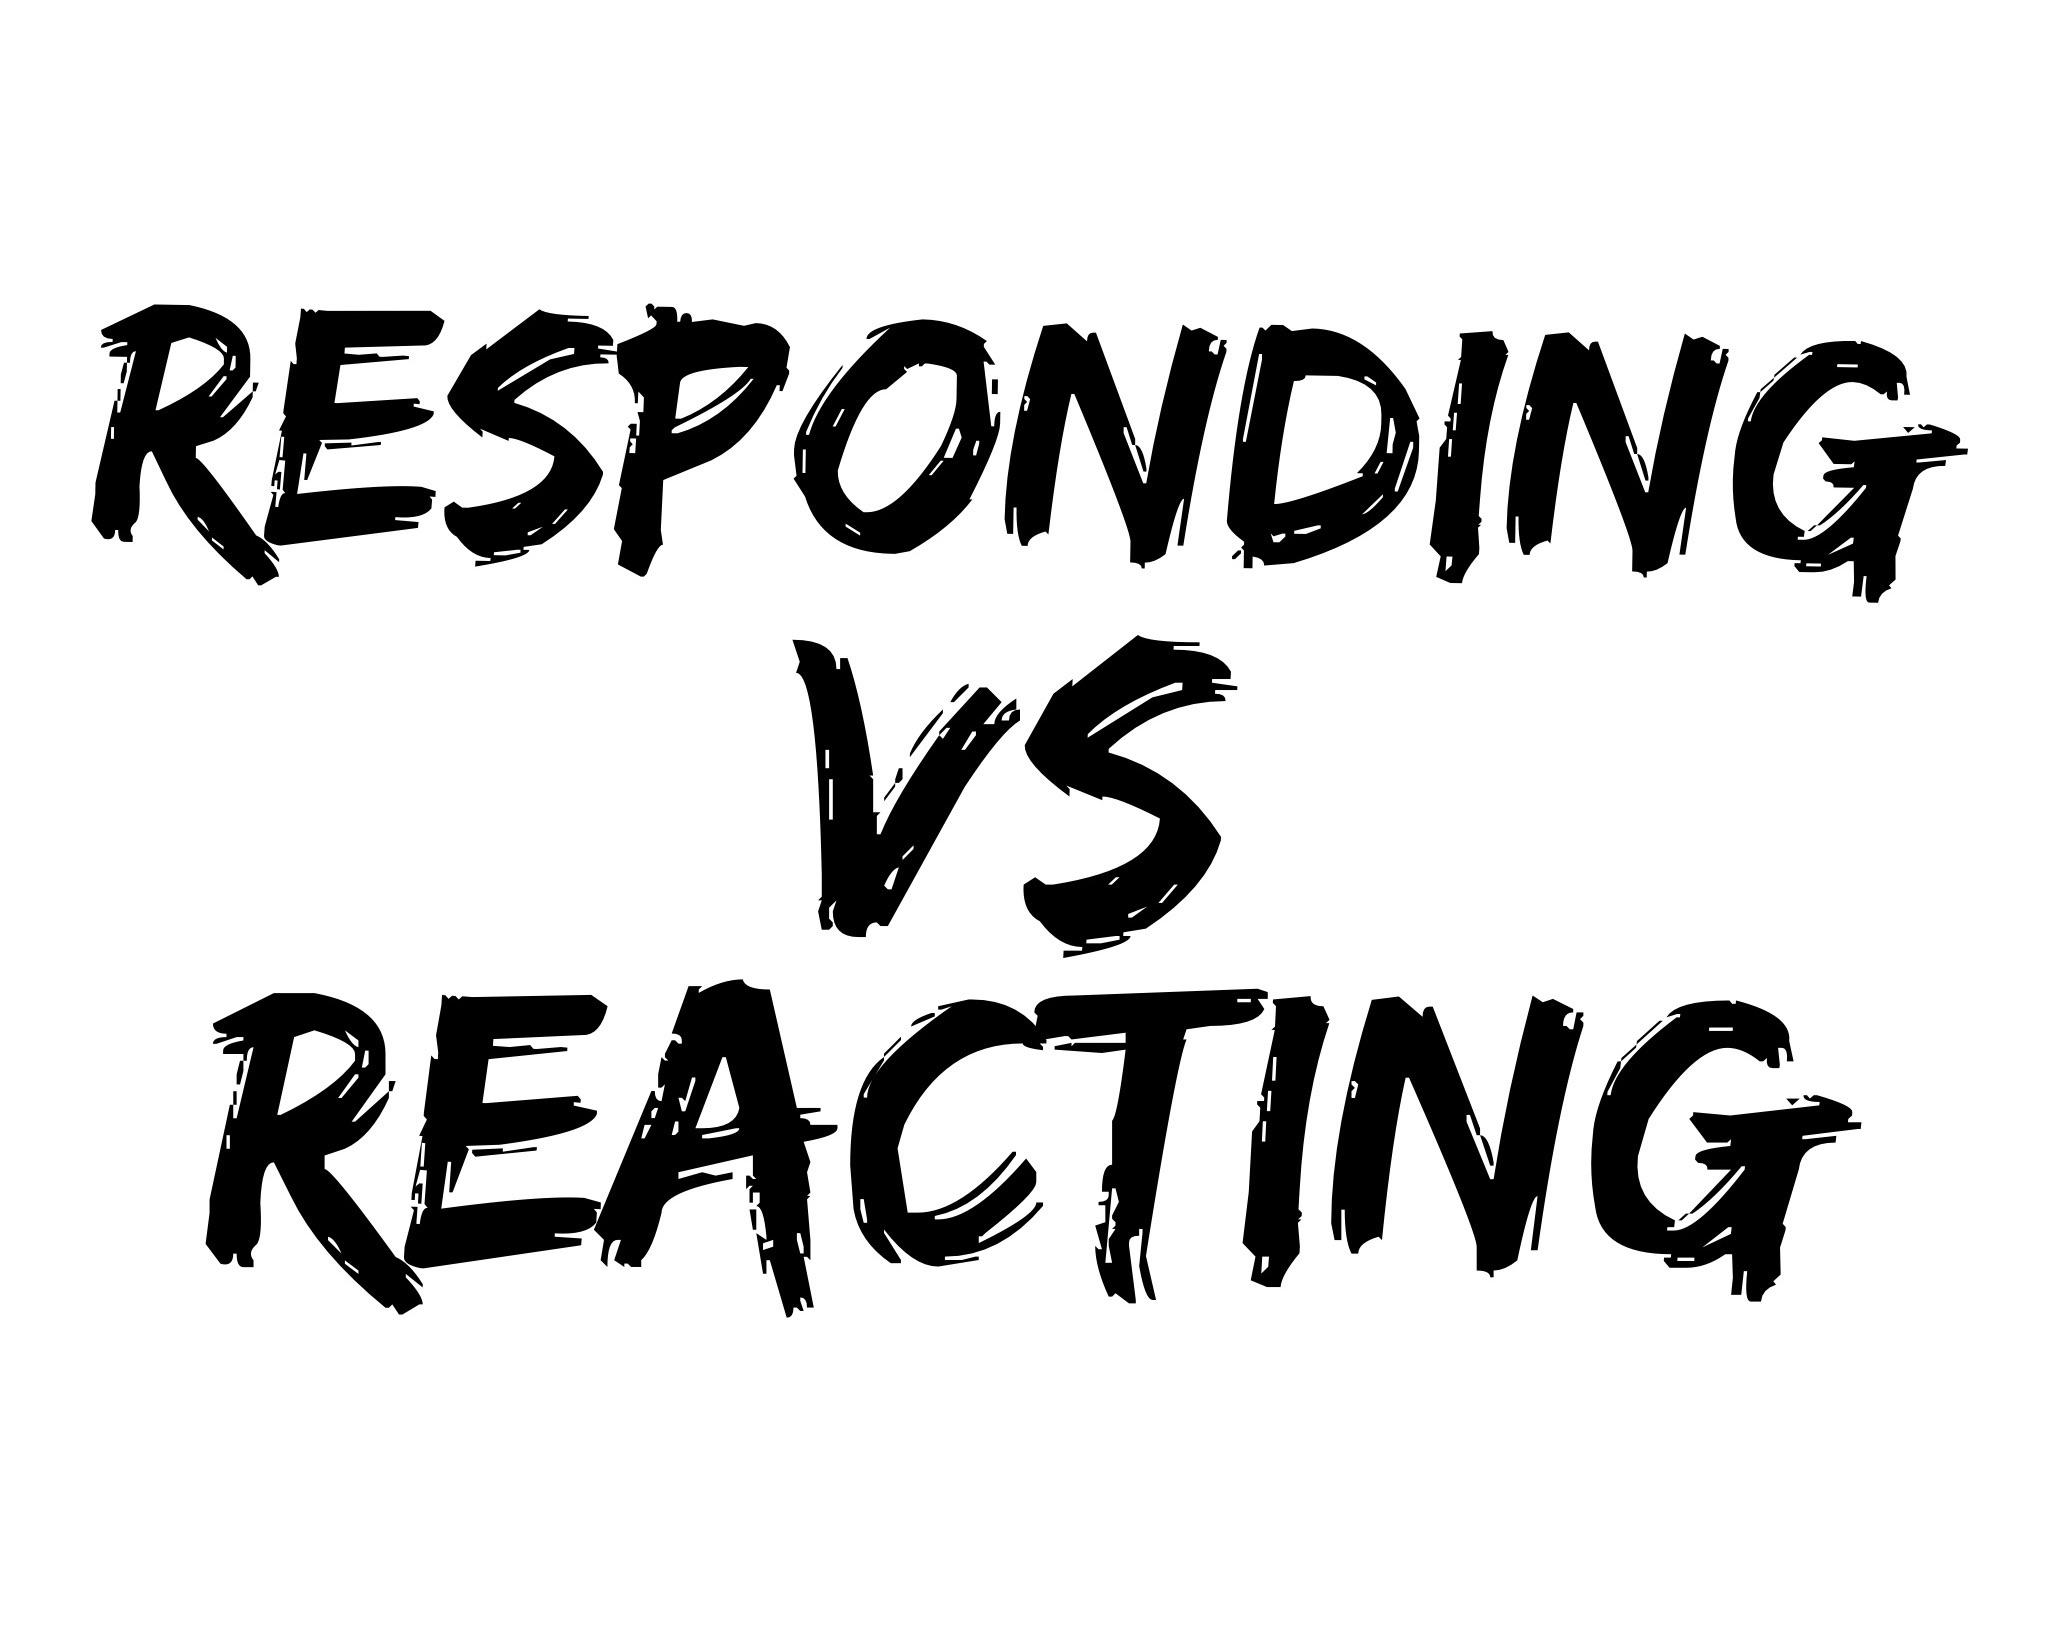 respond_rather_than_react